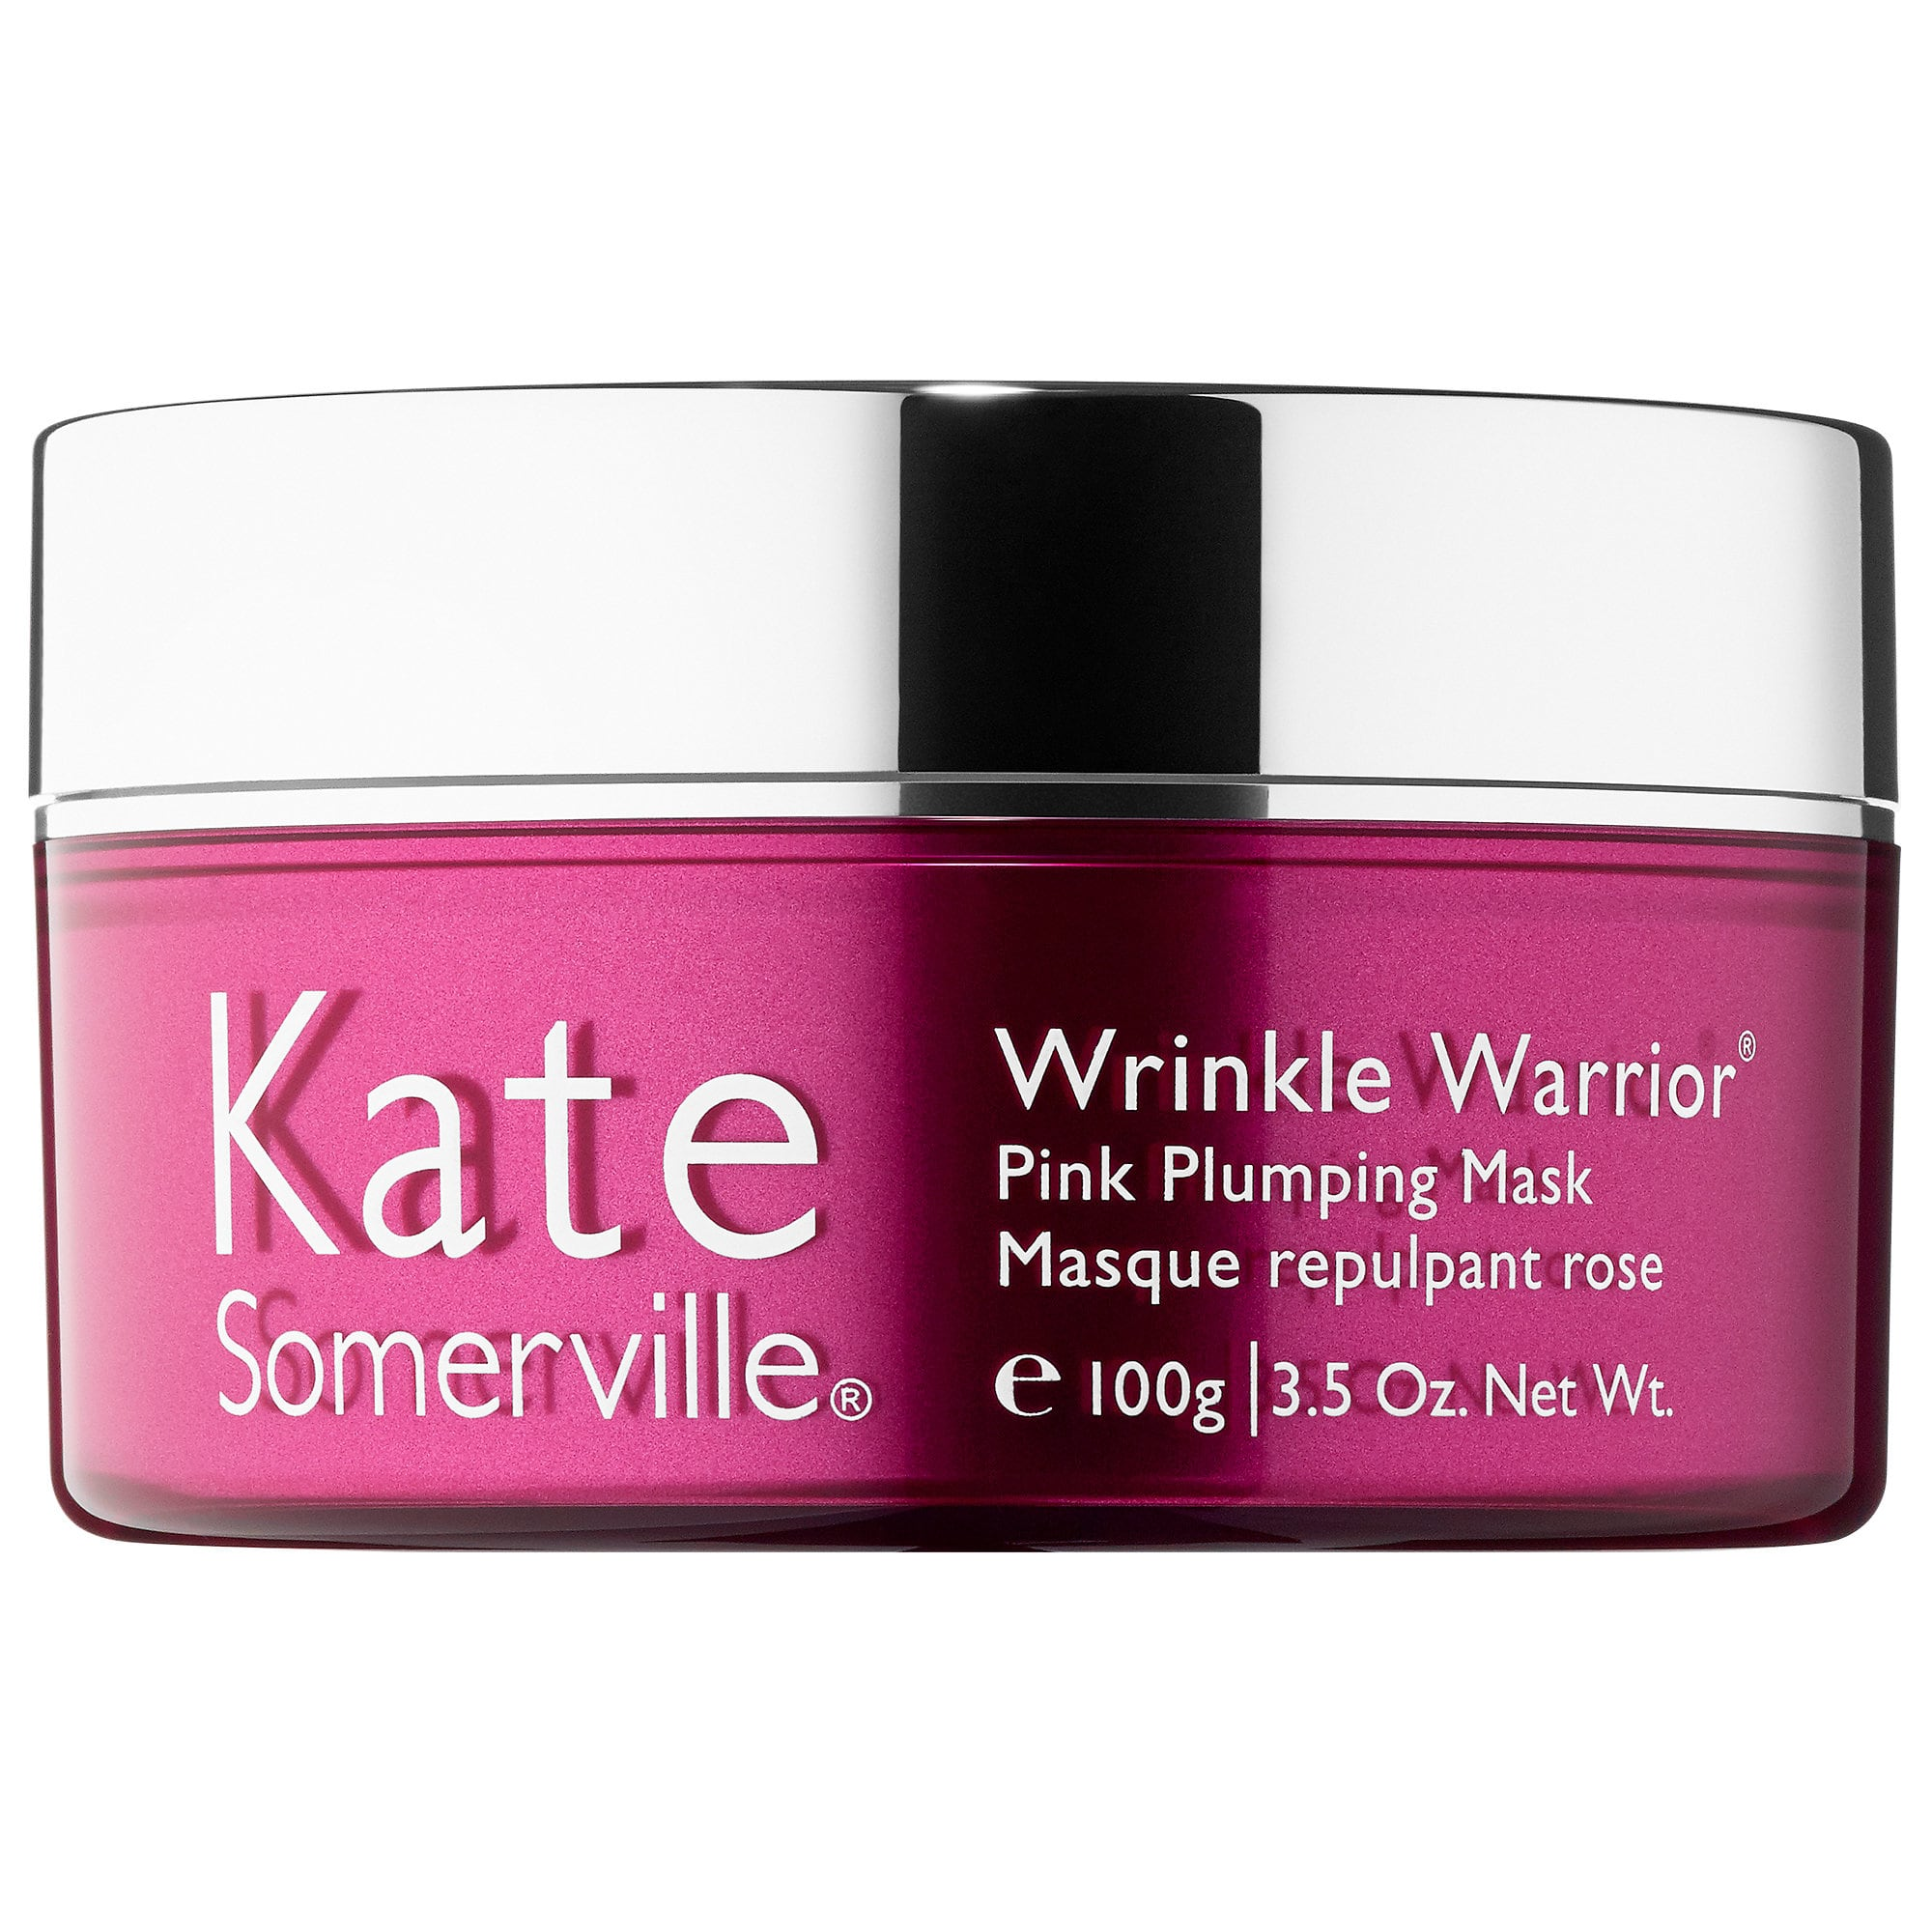 Kate Somerville Skincare Wrinkle Warrior Pink Plumping Mask